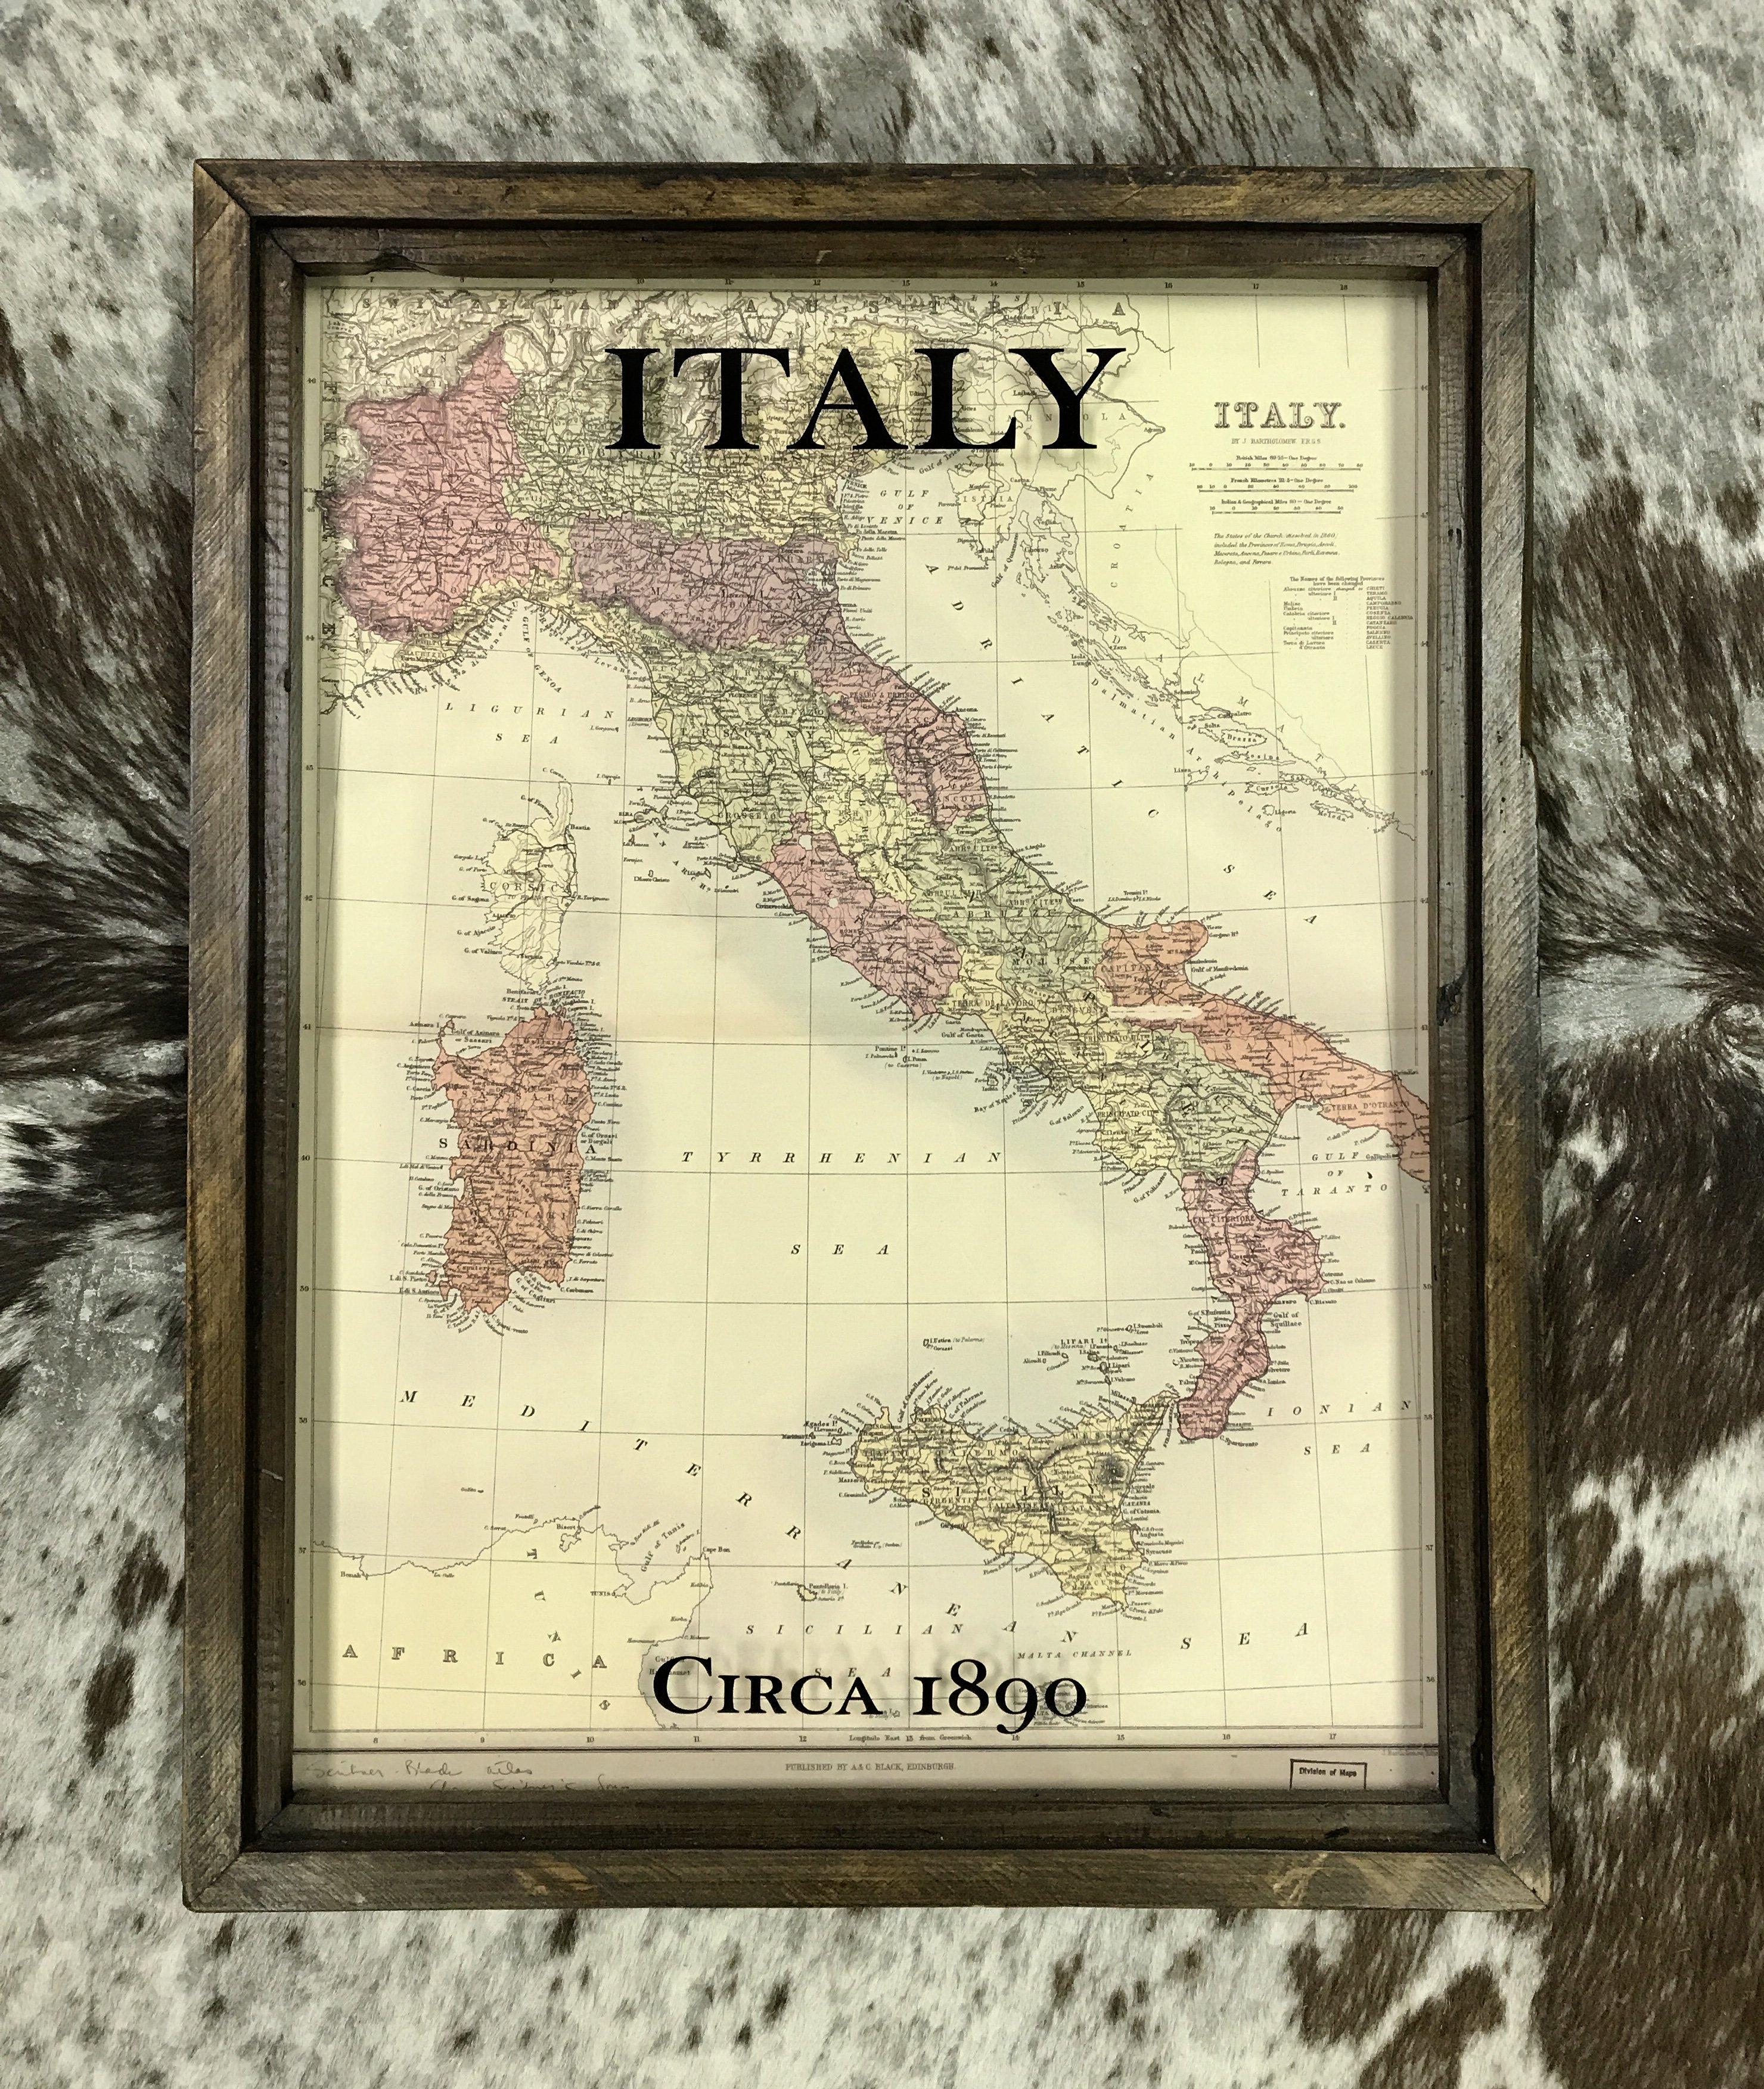 Framed Antique Italy Map, circa 1890 - framed in reclaimed barn wood ...